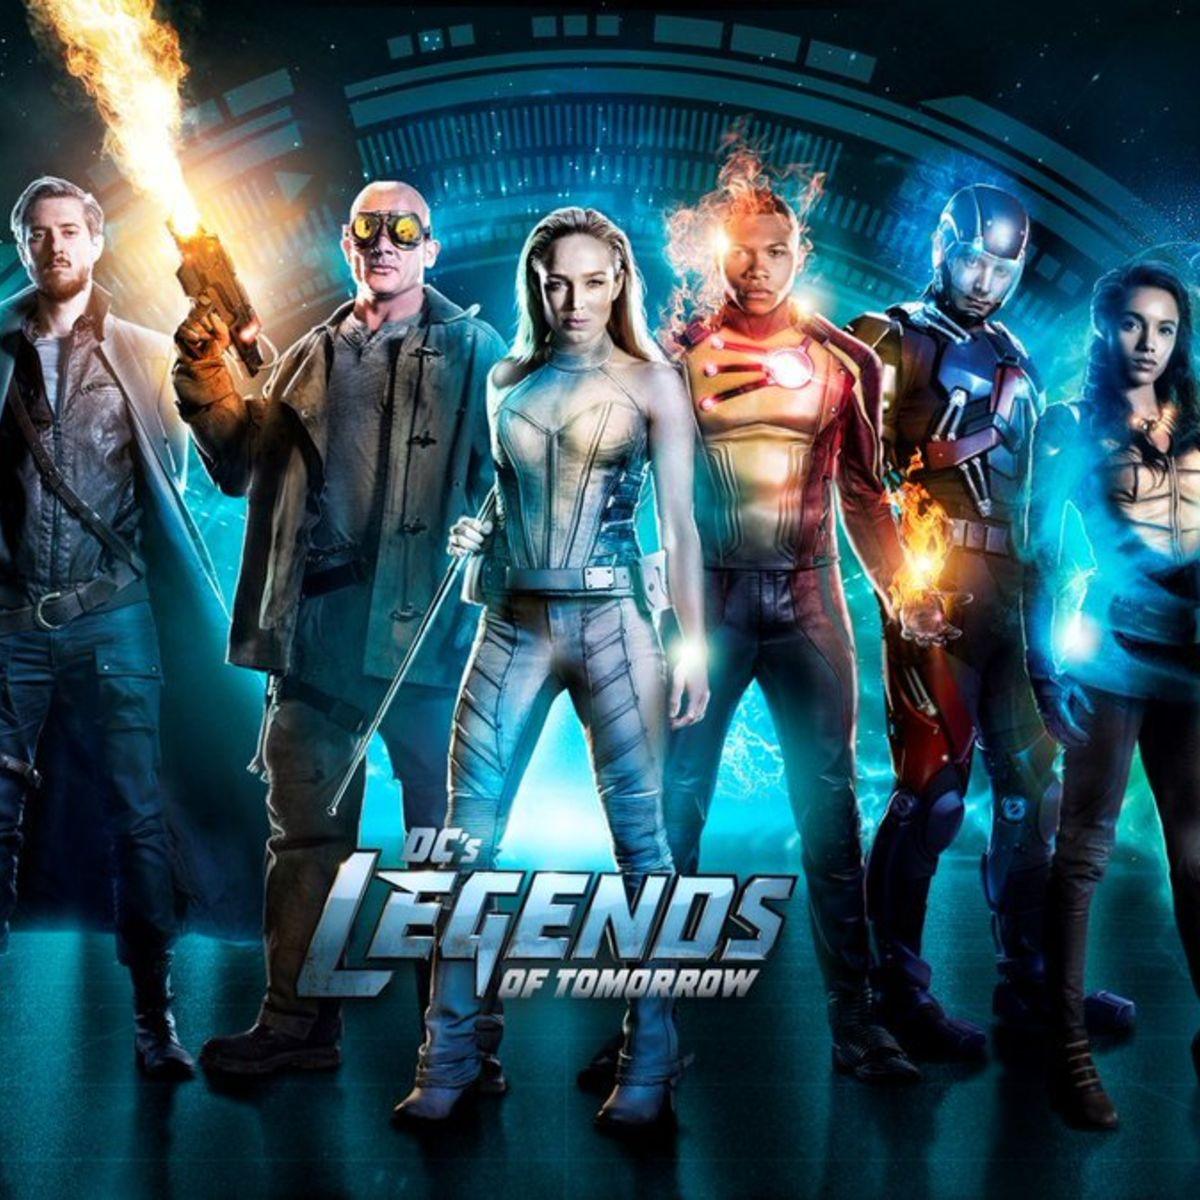 Legends-of-Tomorrow.jpg